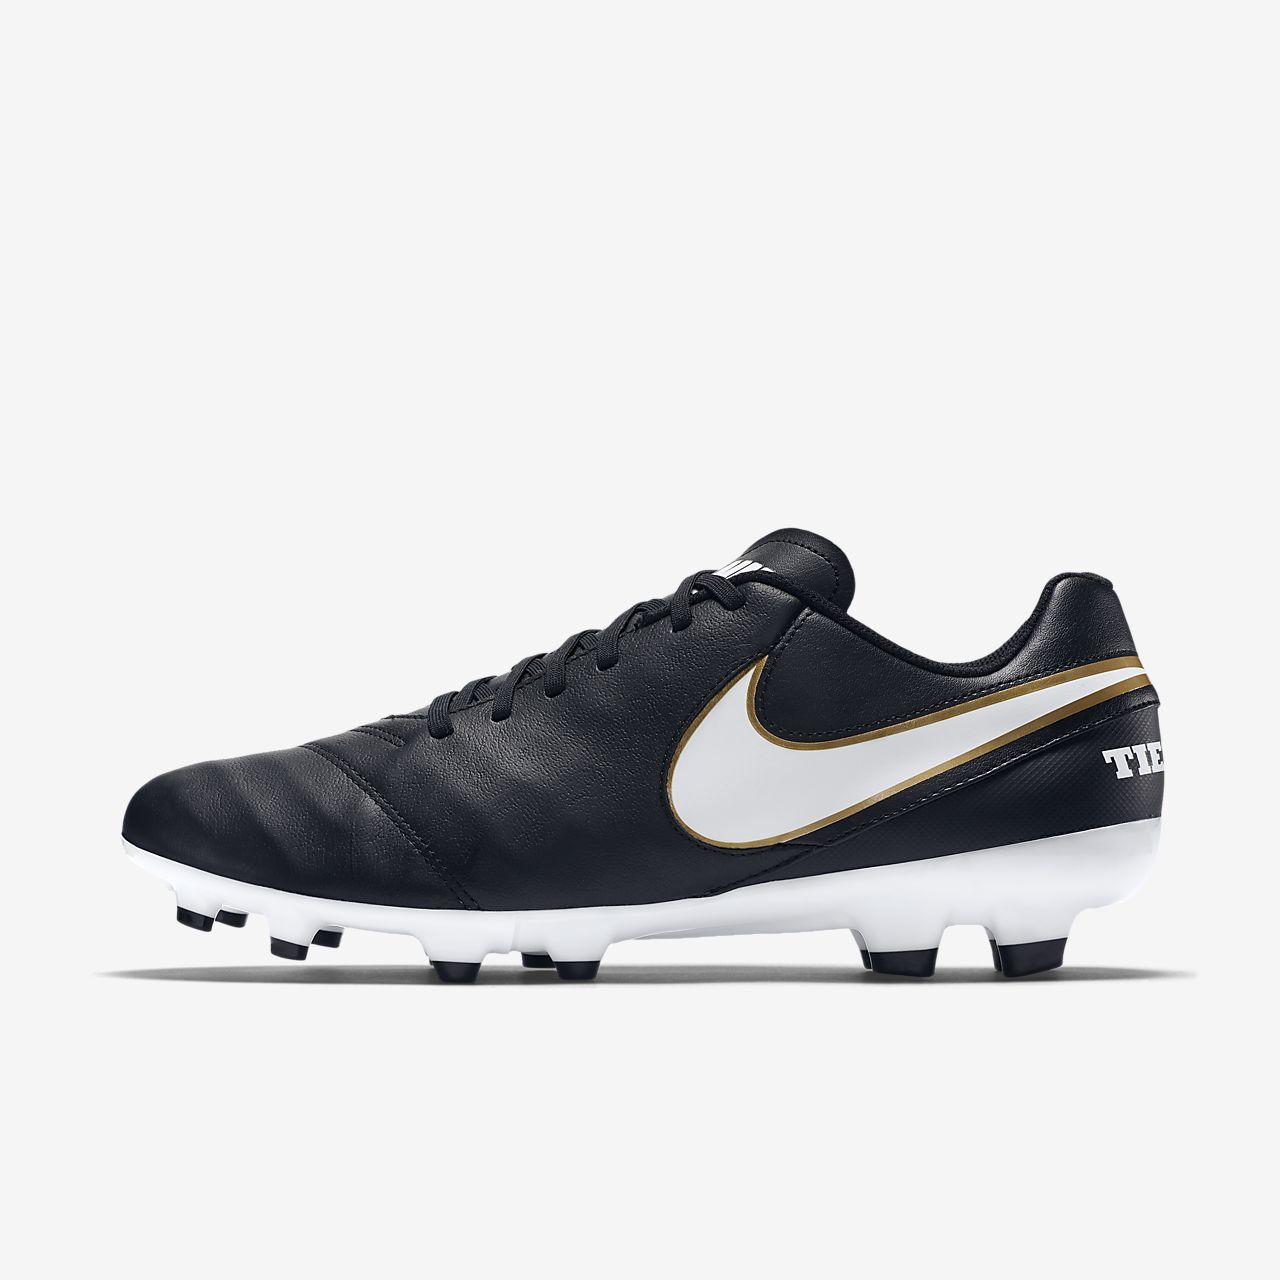 ... Nike Tiempo Genio II Leather Firm-Ground Football Boot